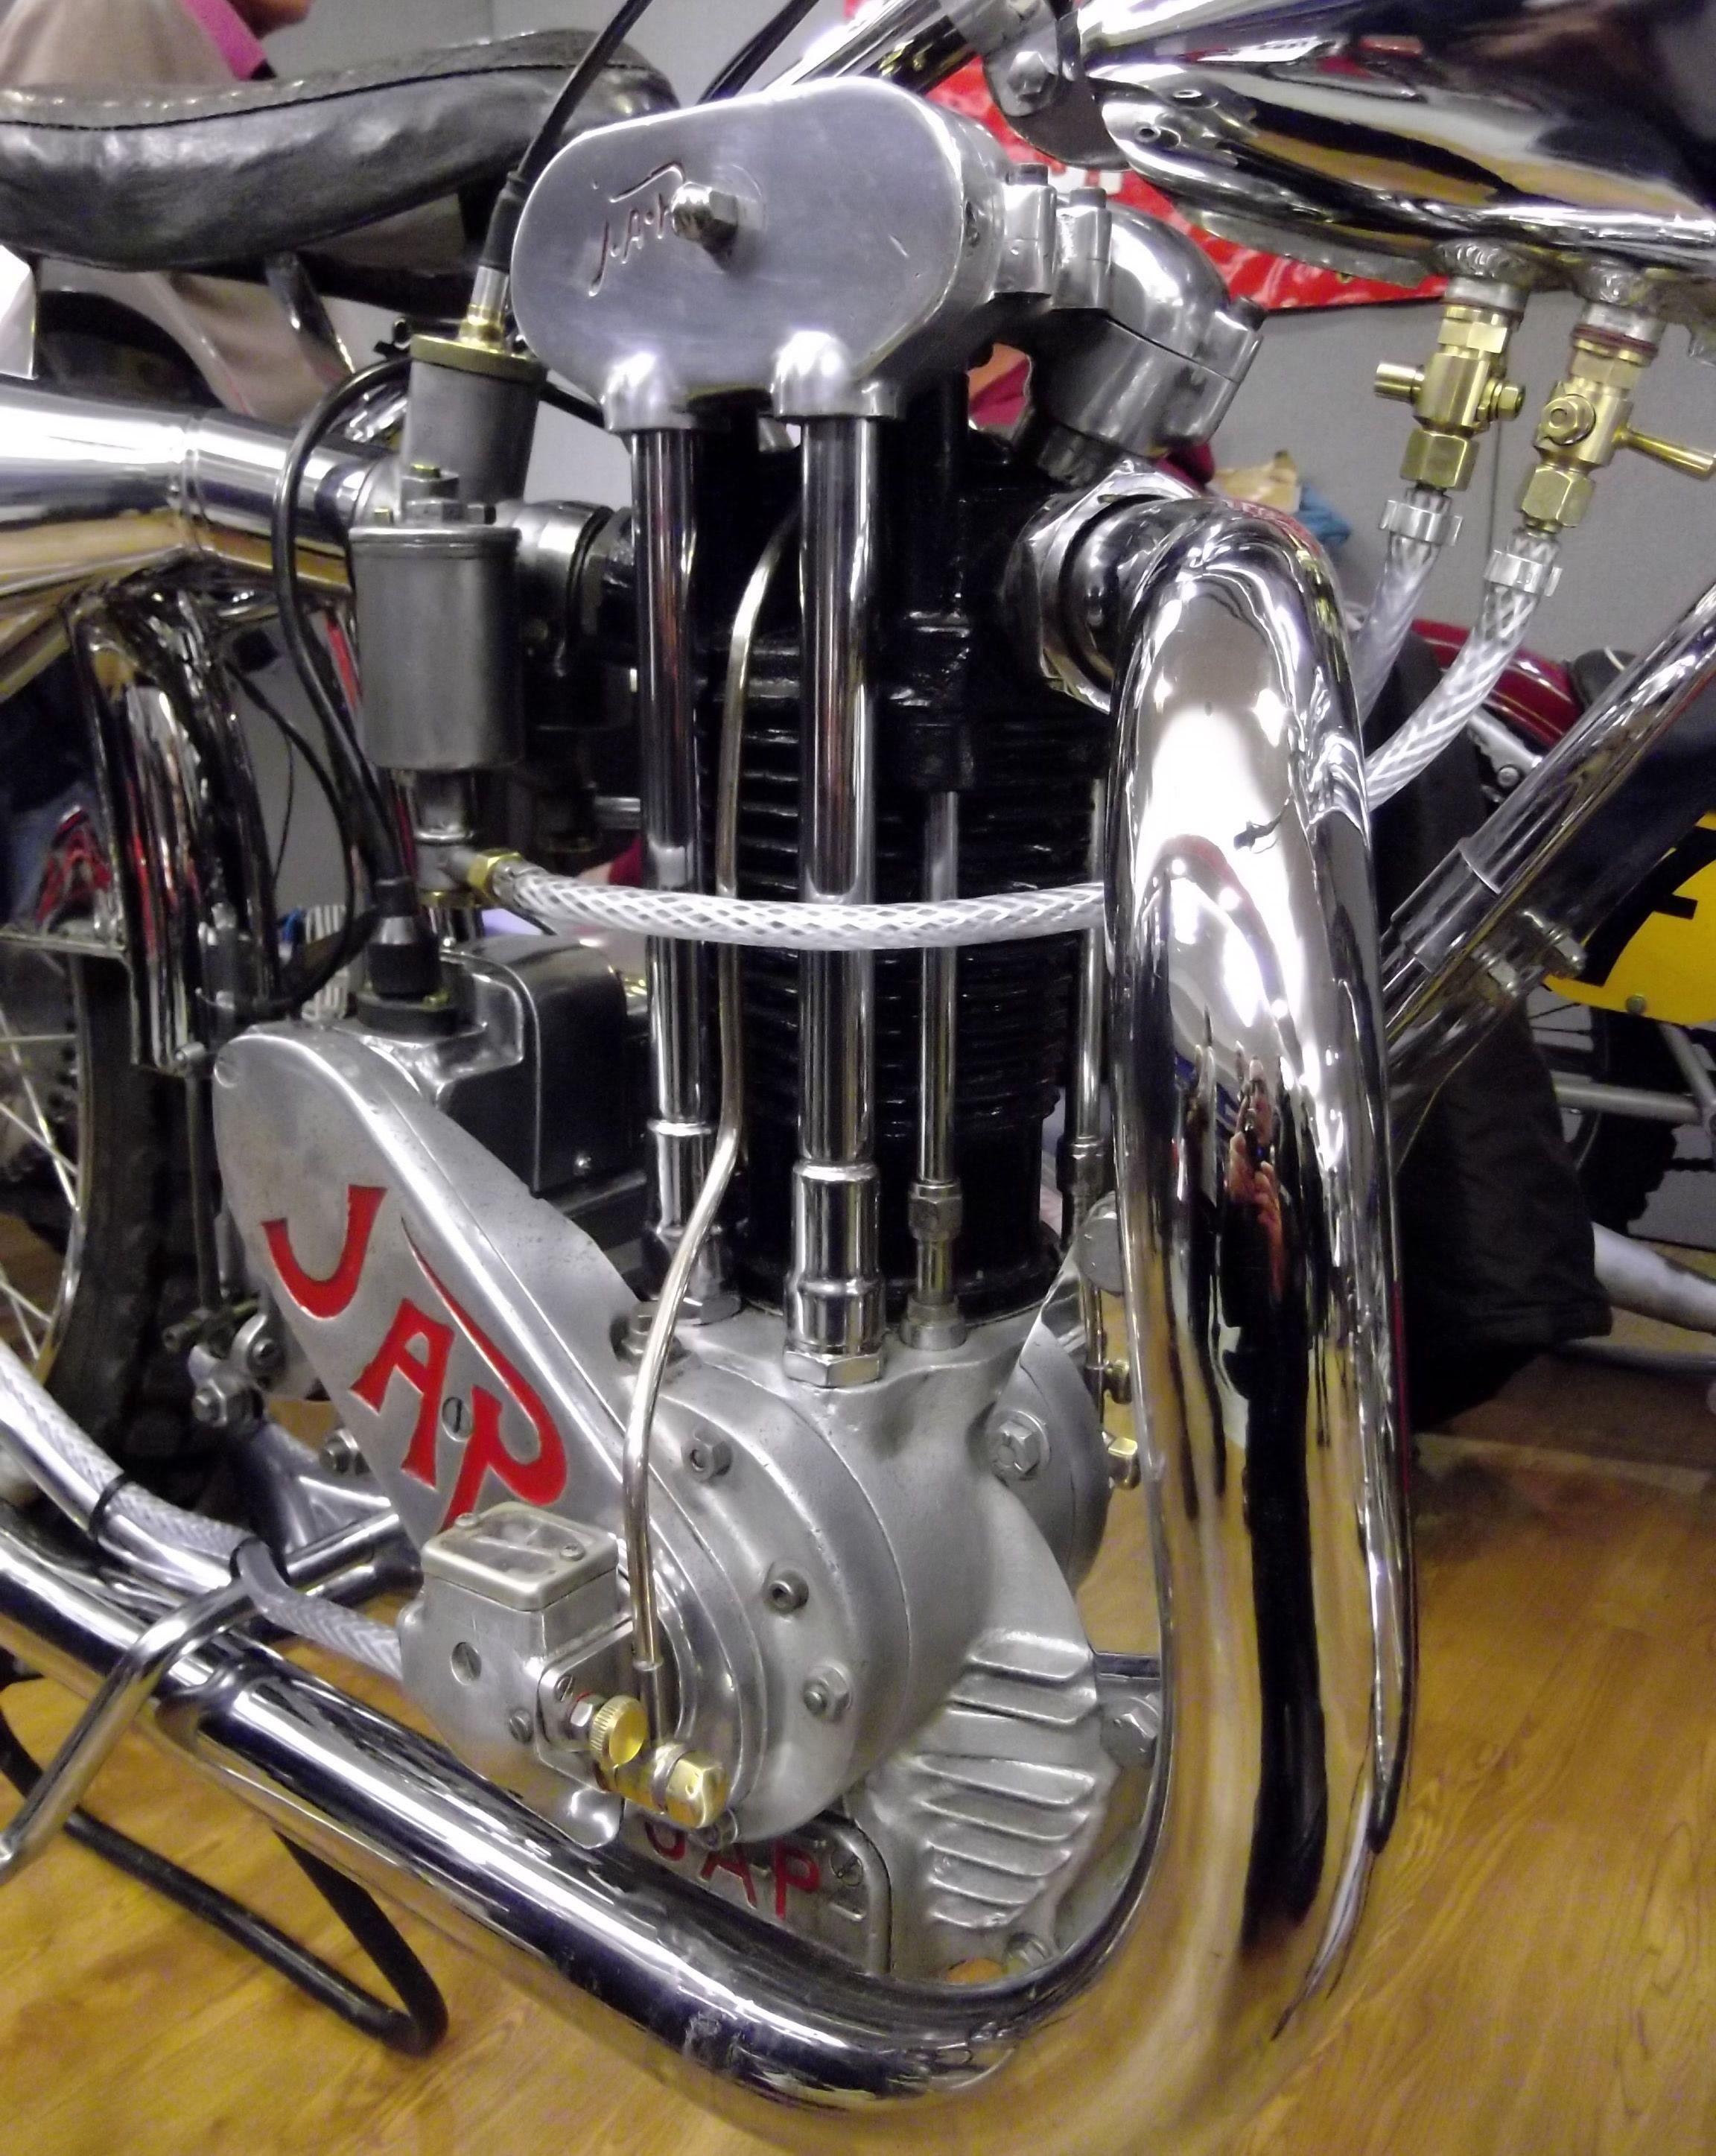 500cc JAP engine, in a speedway bike  Kempton Auto-Jumble